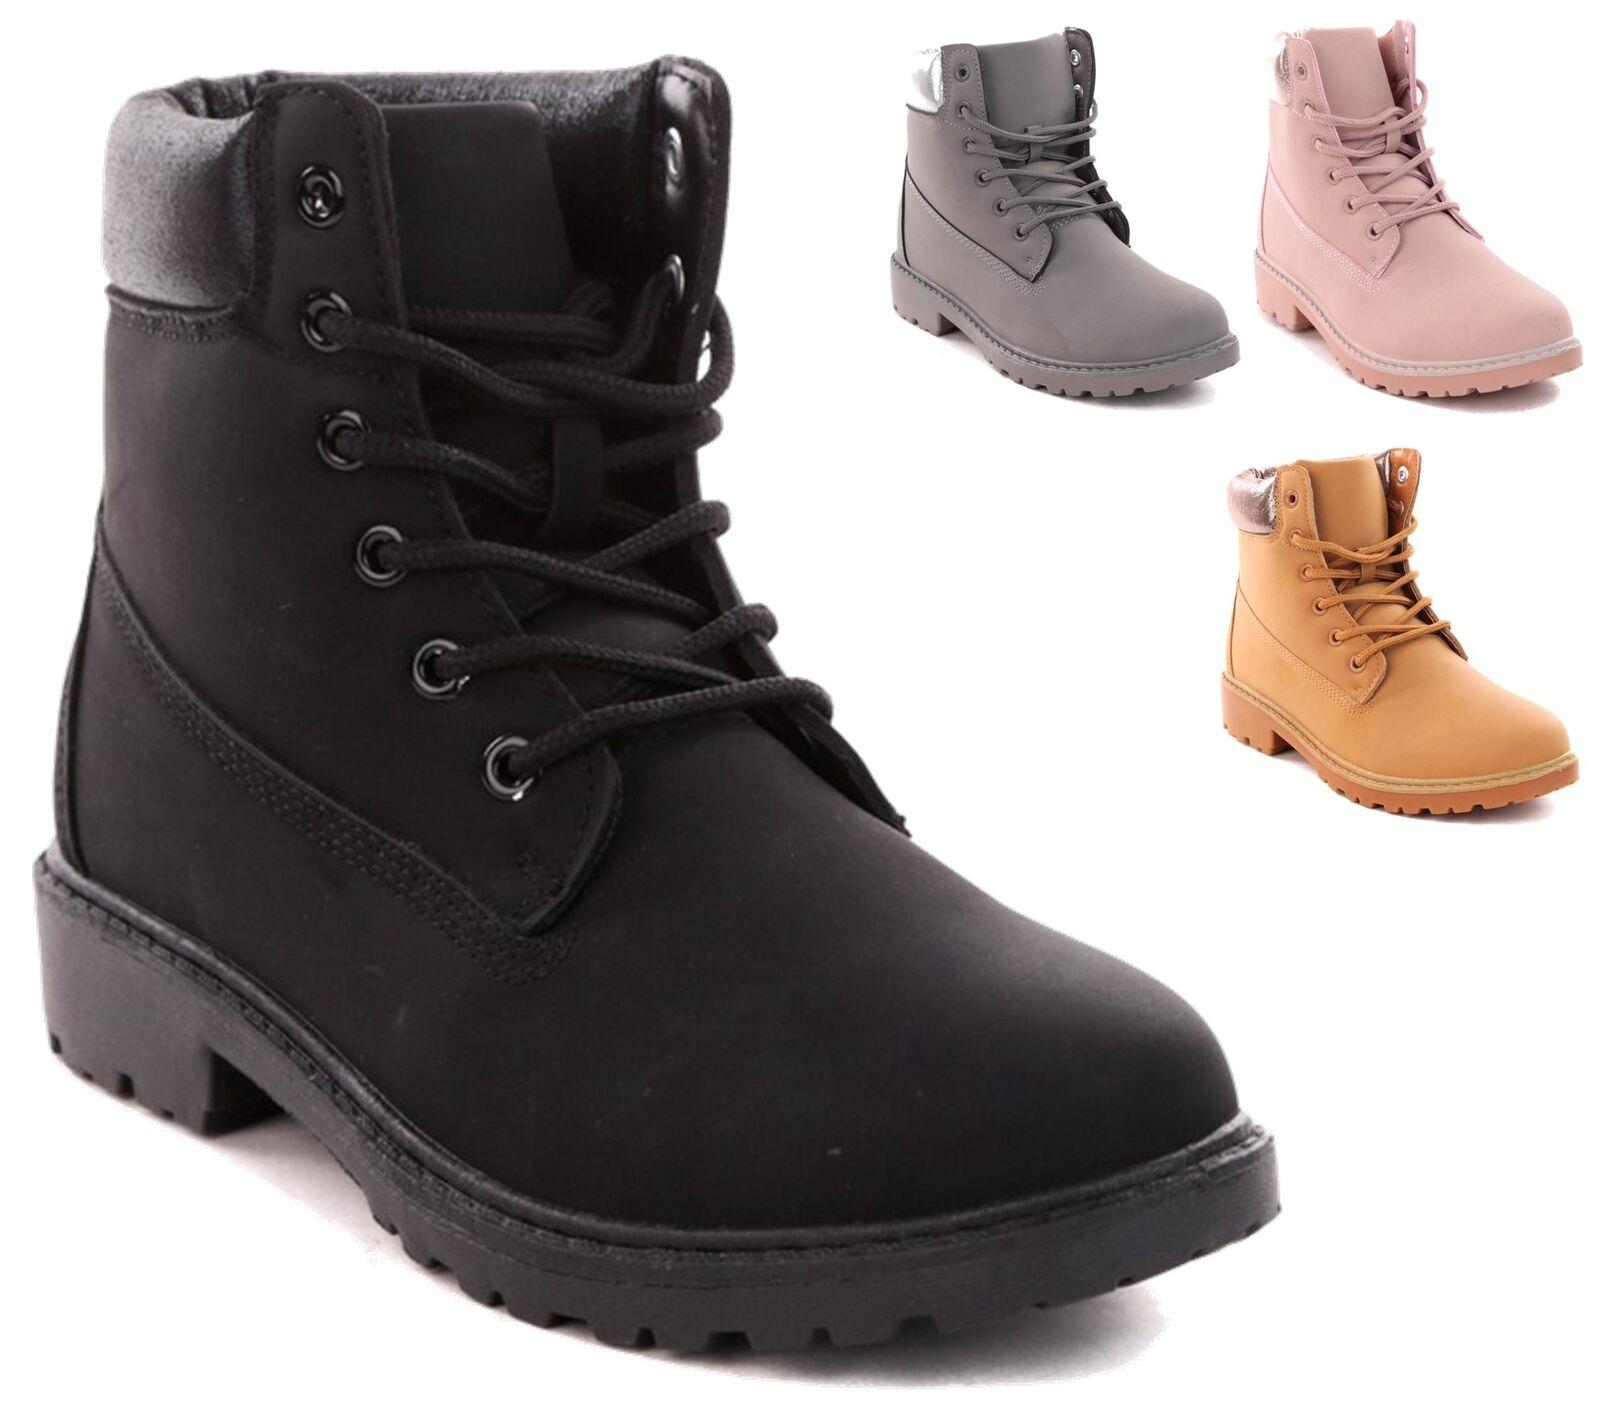 Salomon L37069400 Womens City Cross Nordic Walking Shoes